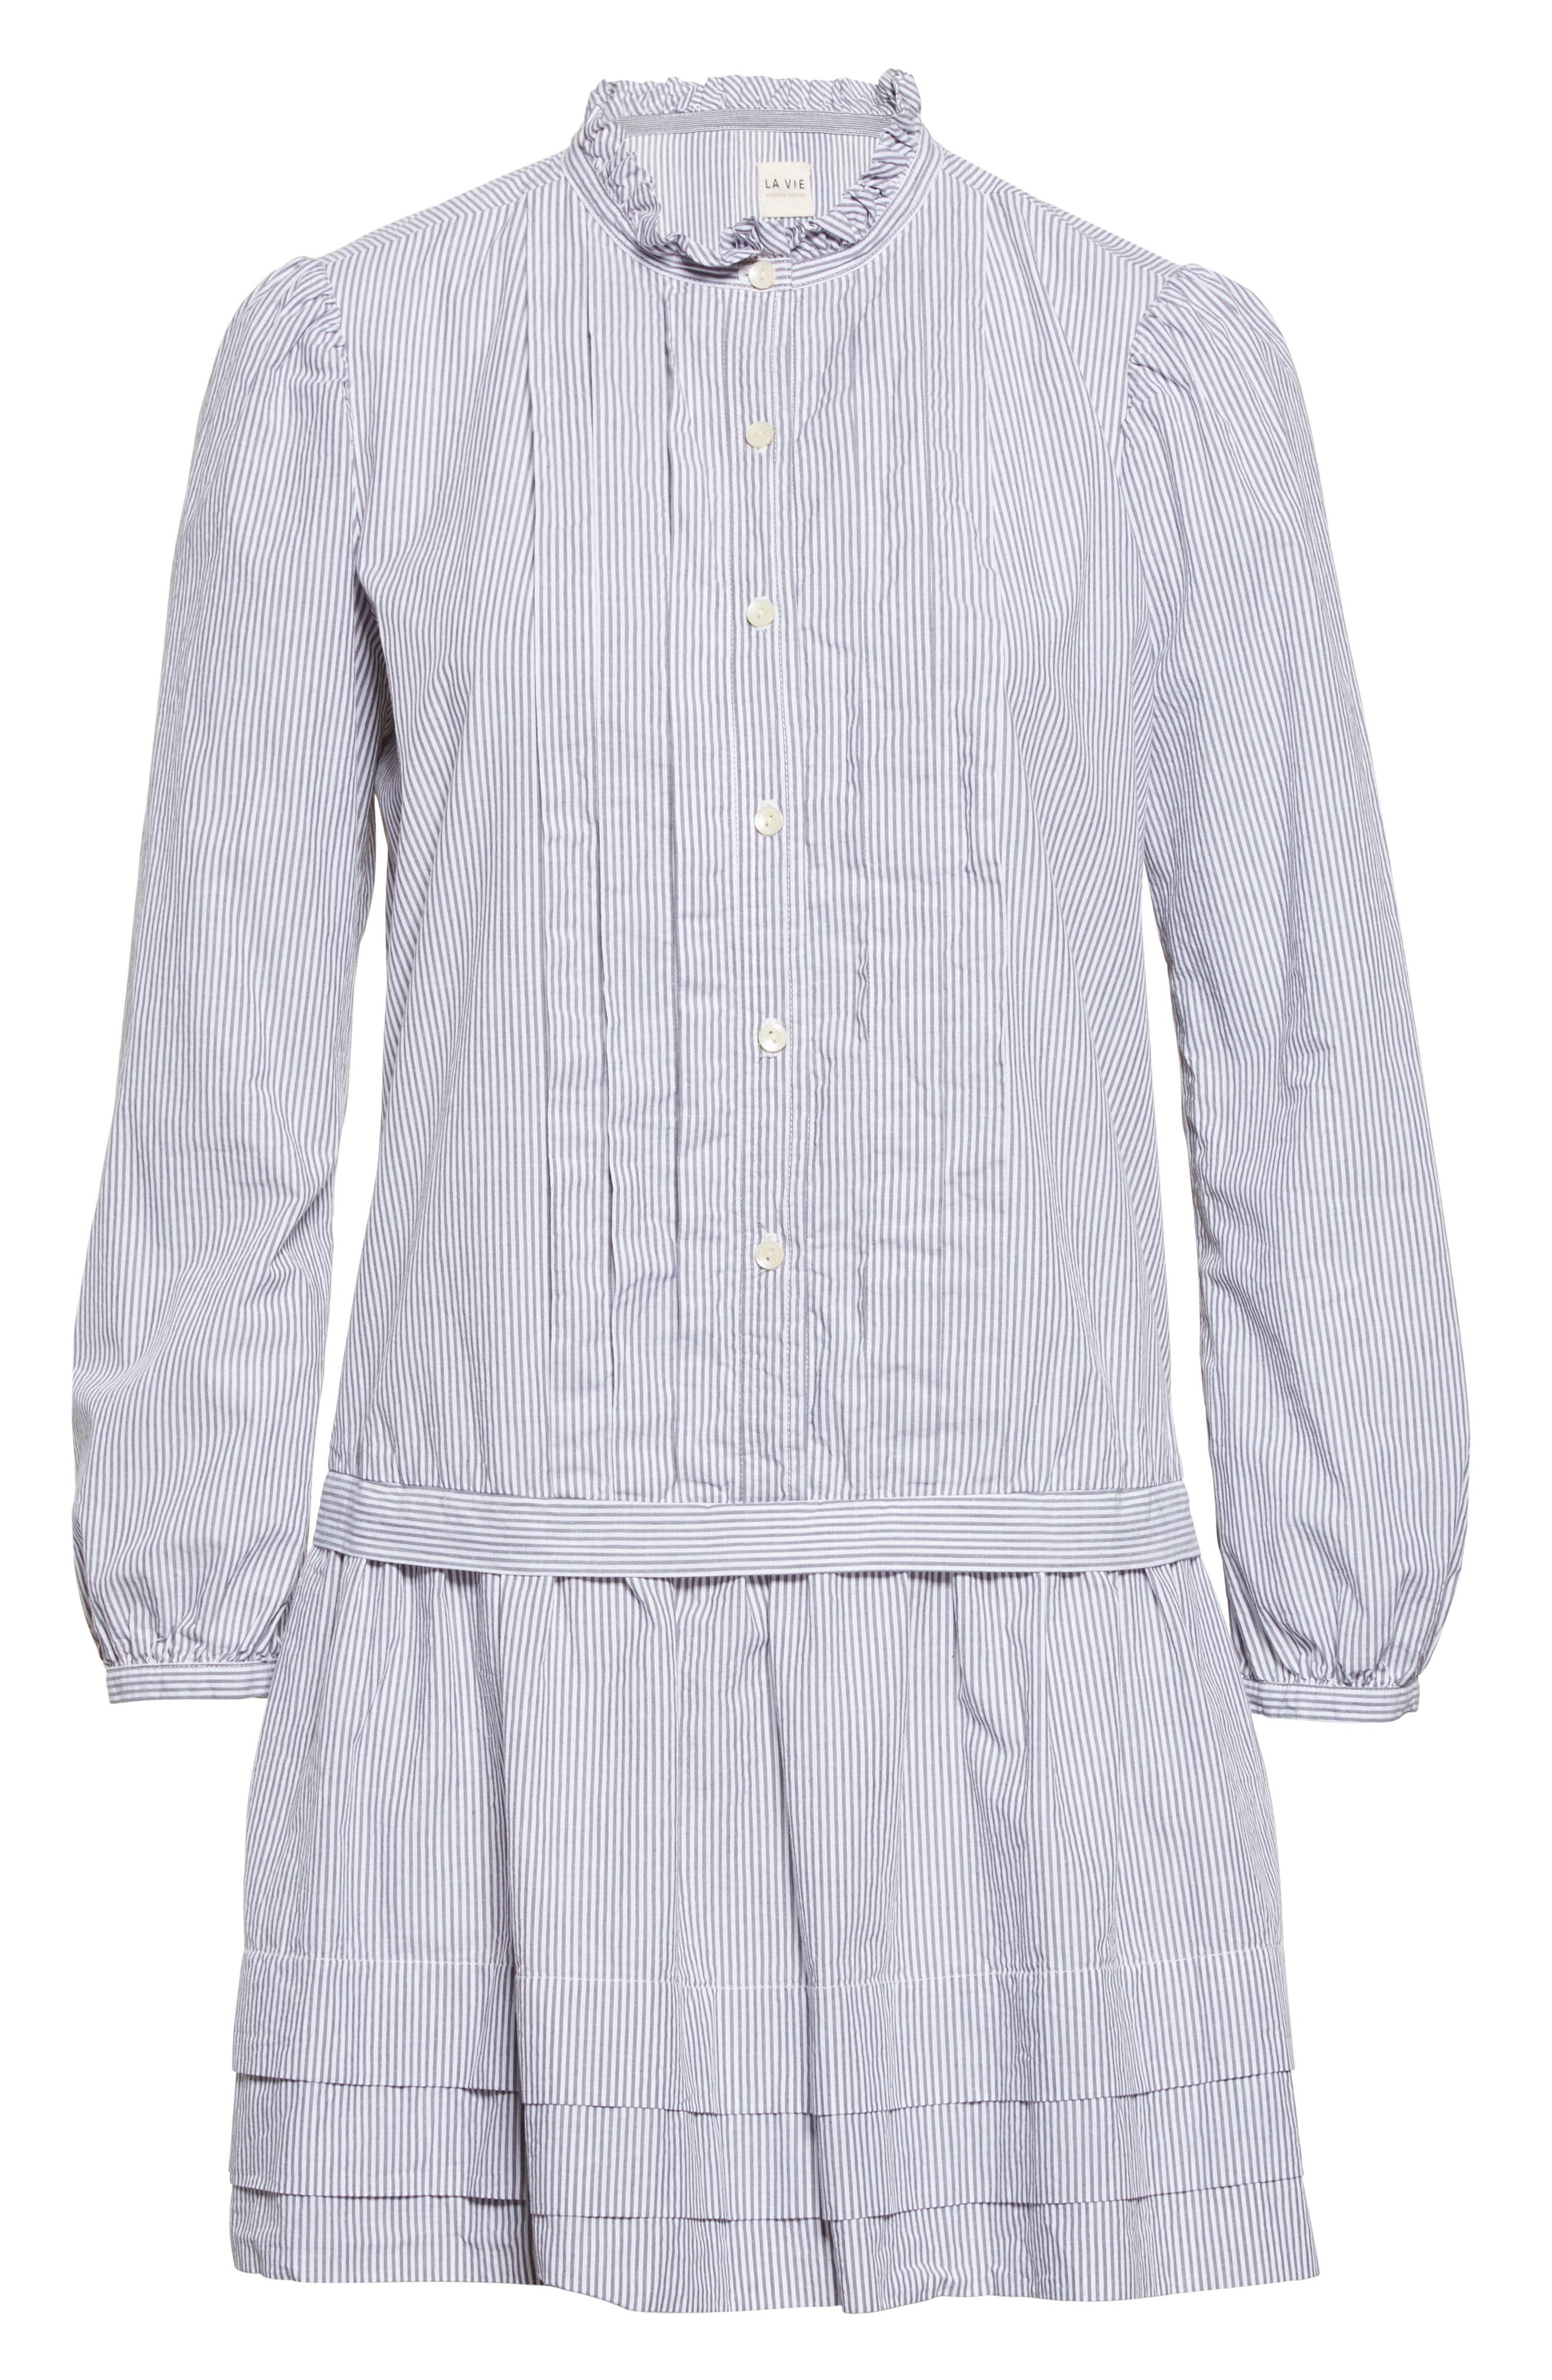 Cotton Shirtdress,                             Alternate thumbnail 6, color,                             Black/ Milk